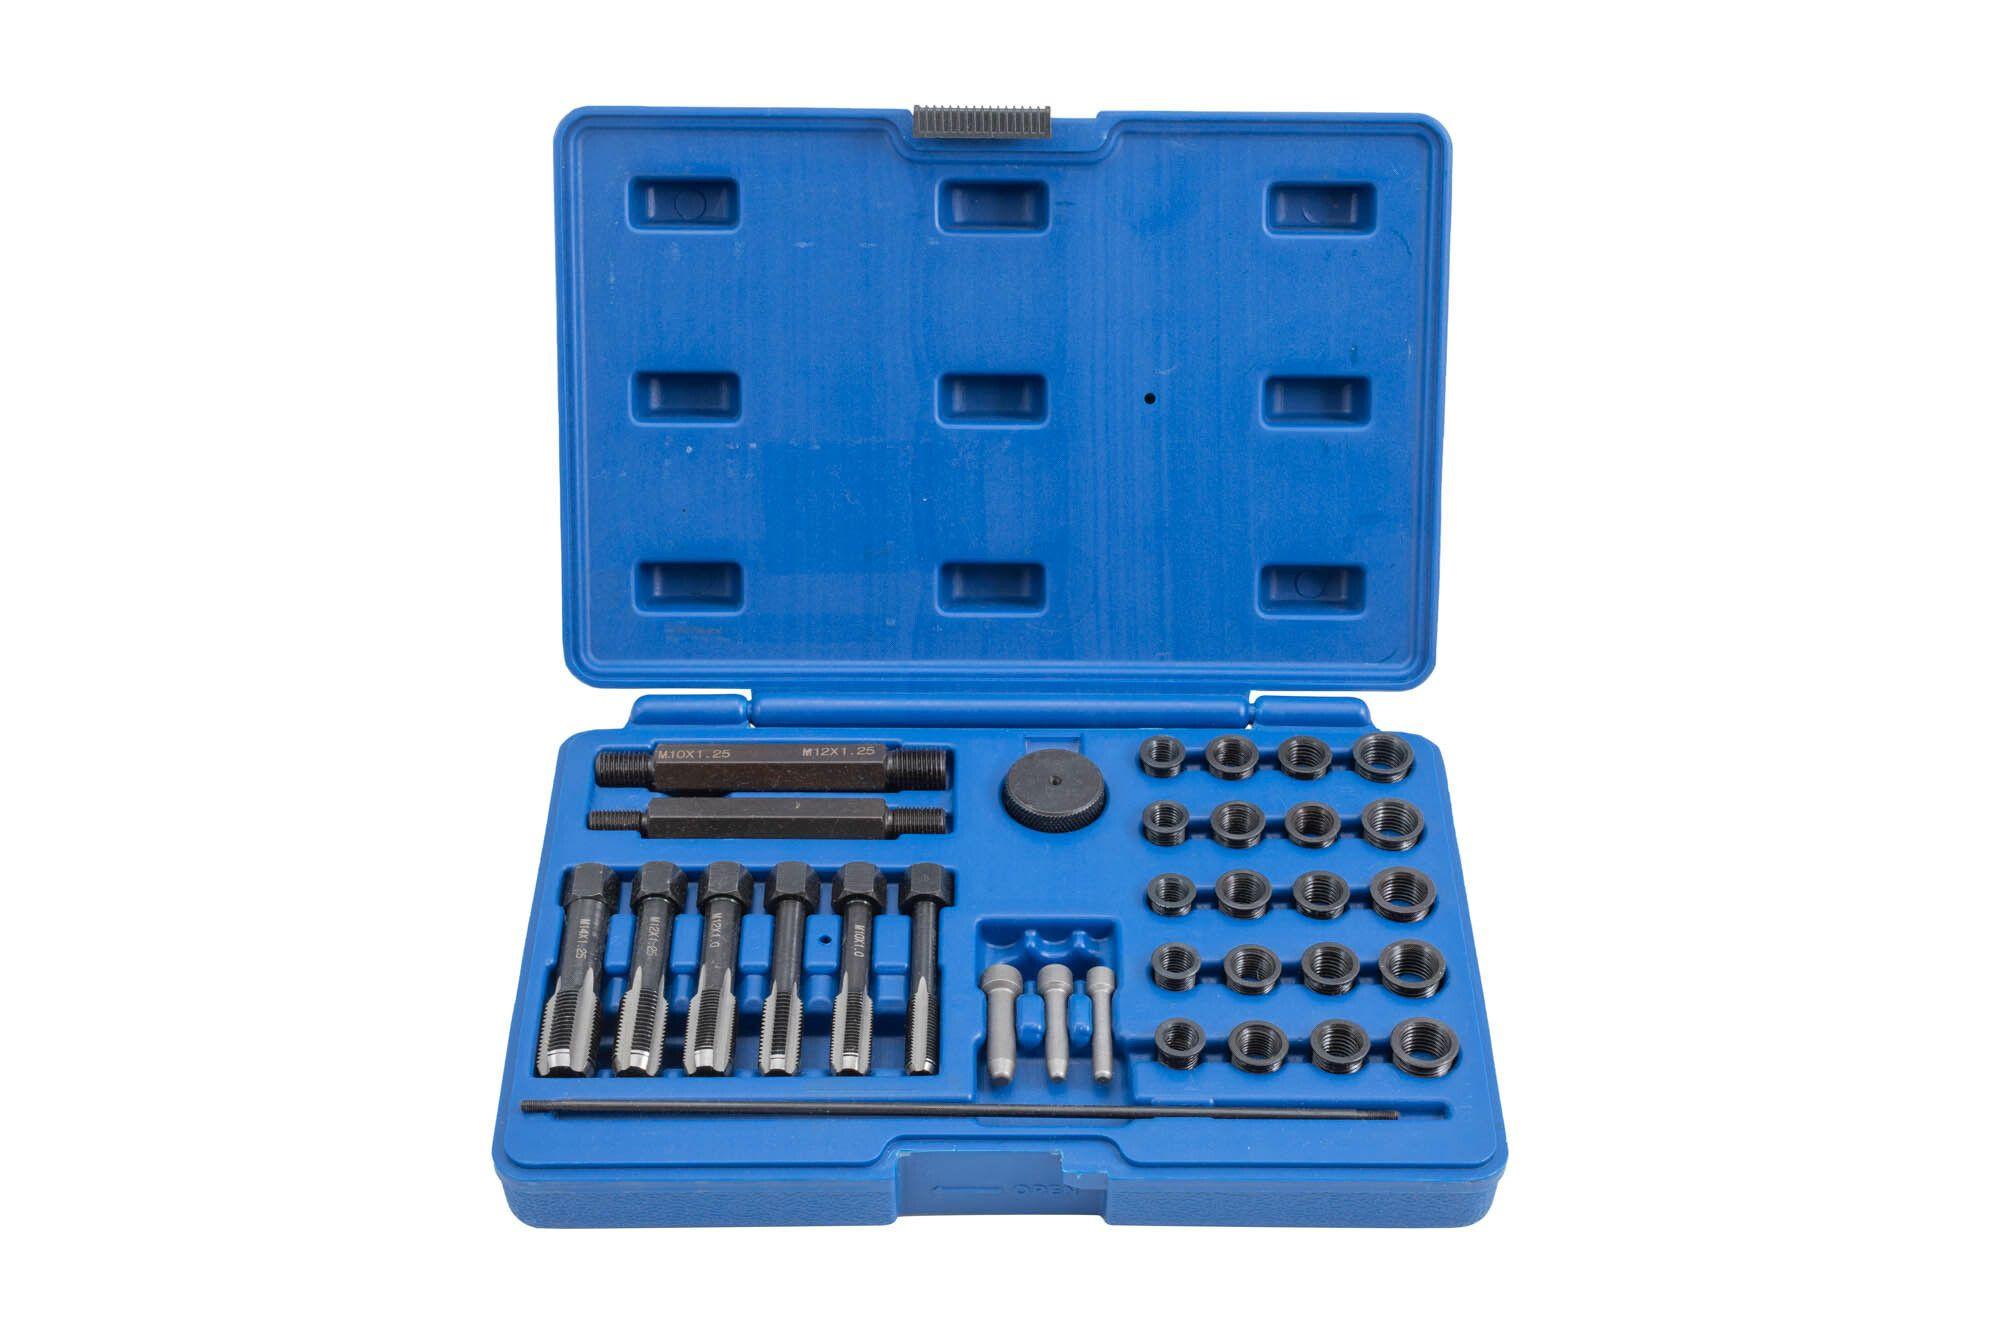 Sada na opravu závitů žhavicích svíček  M8x1, M10x1, M10x1.25, M12x1.25, 33 kusů QUATROS QS14140